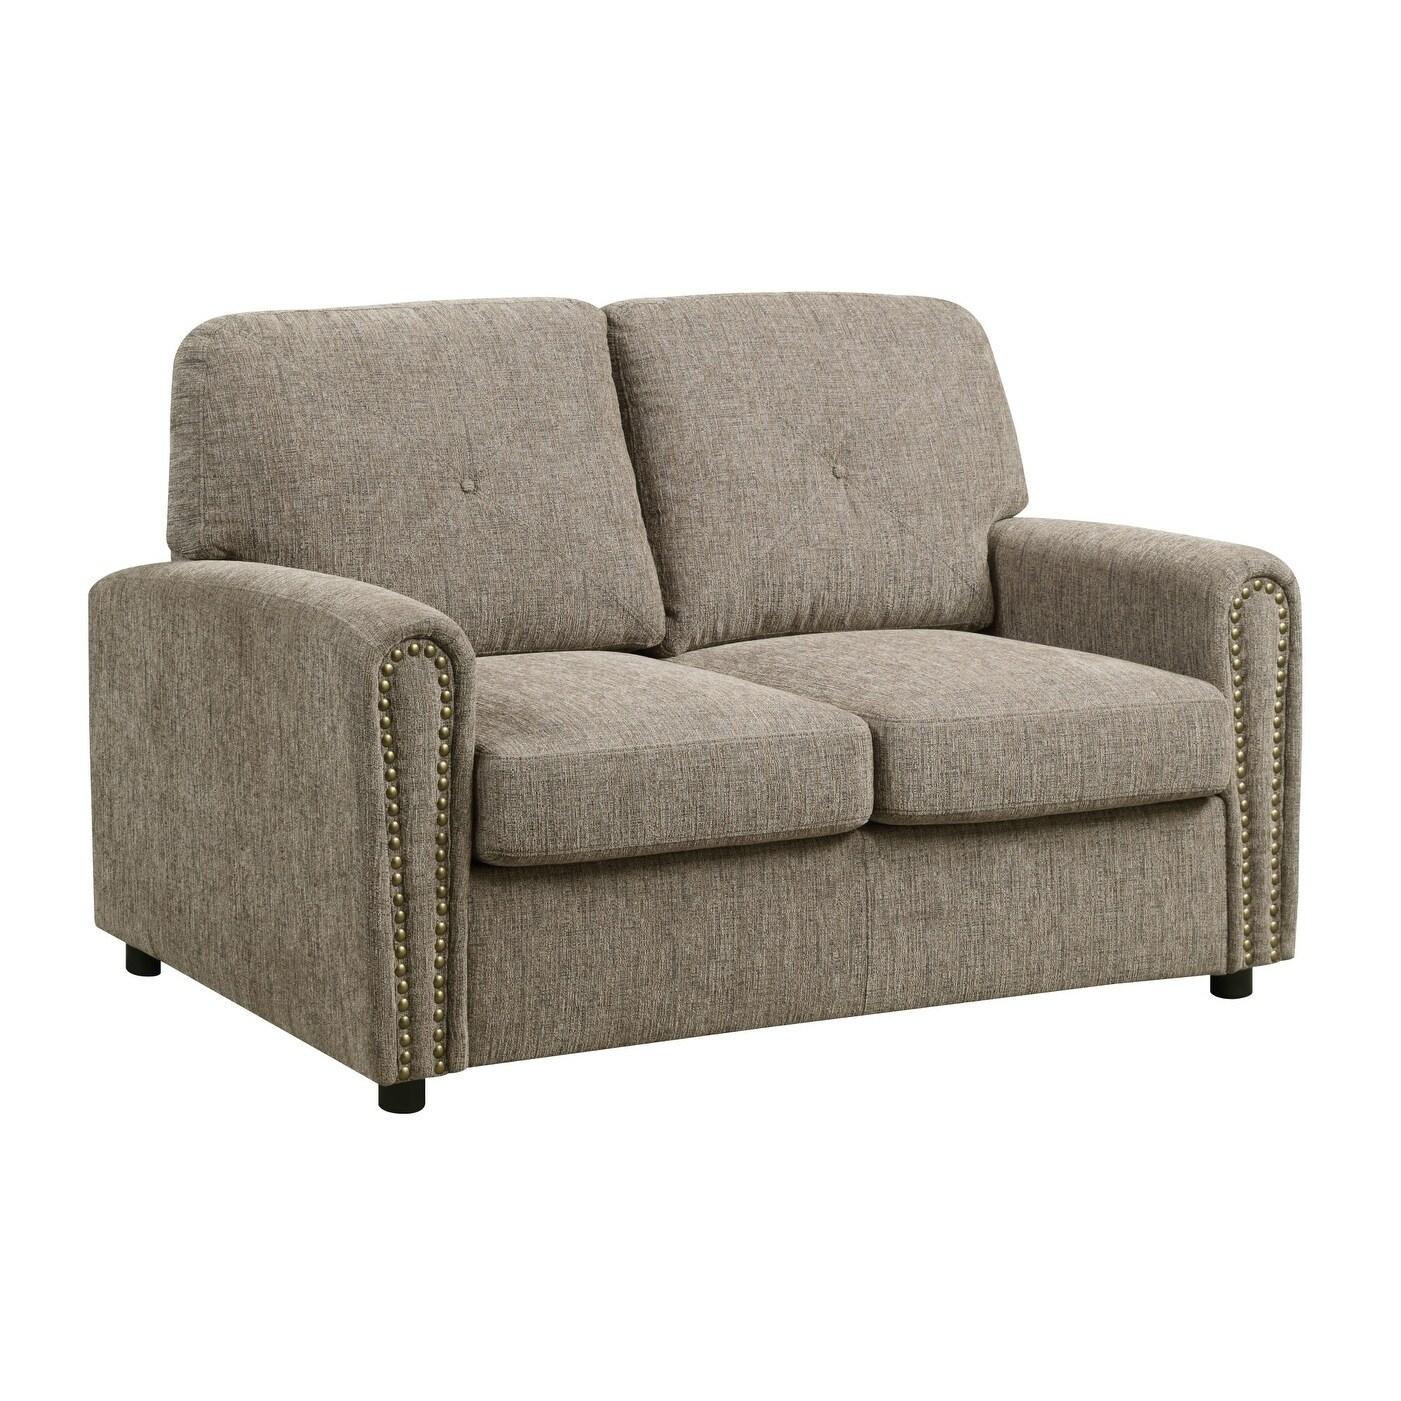 Serenity Brown 72 Sleeper Sofa